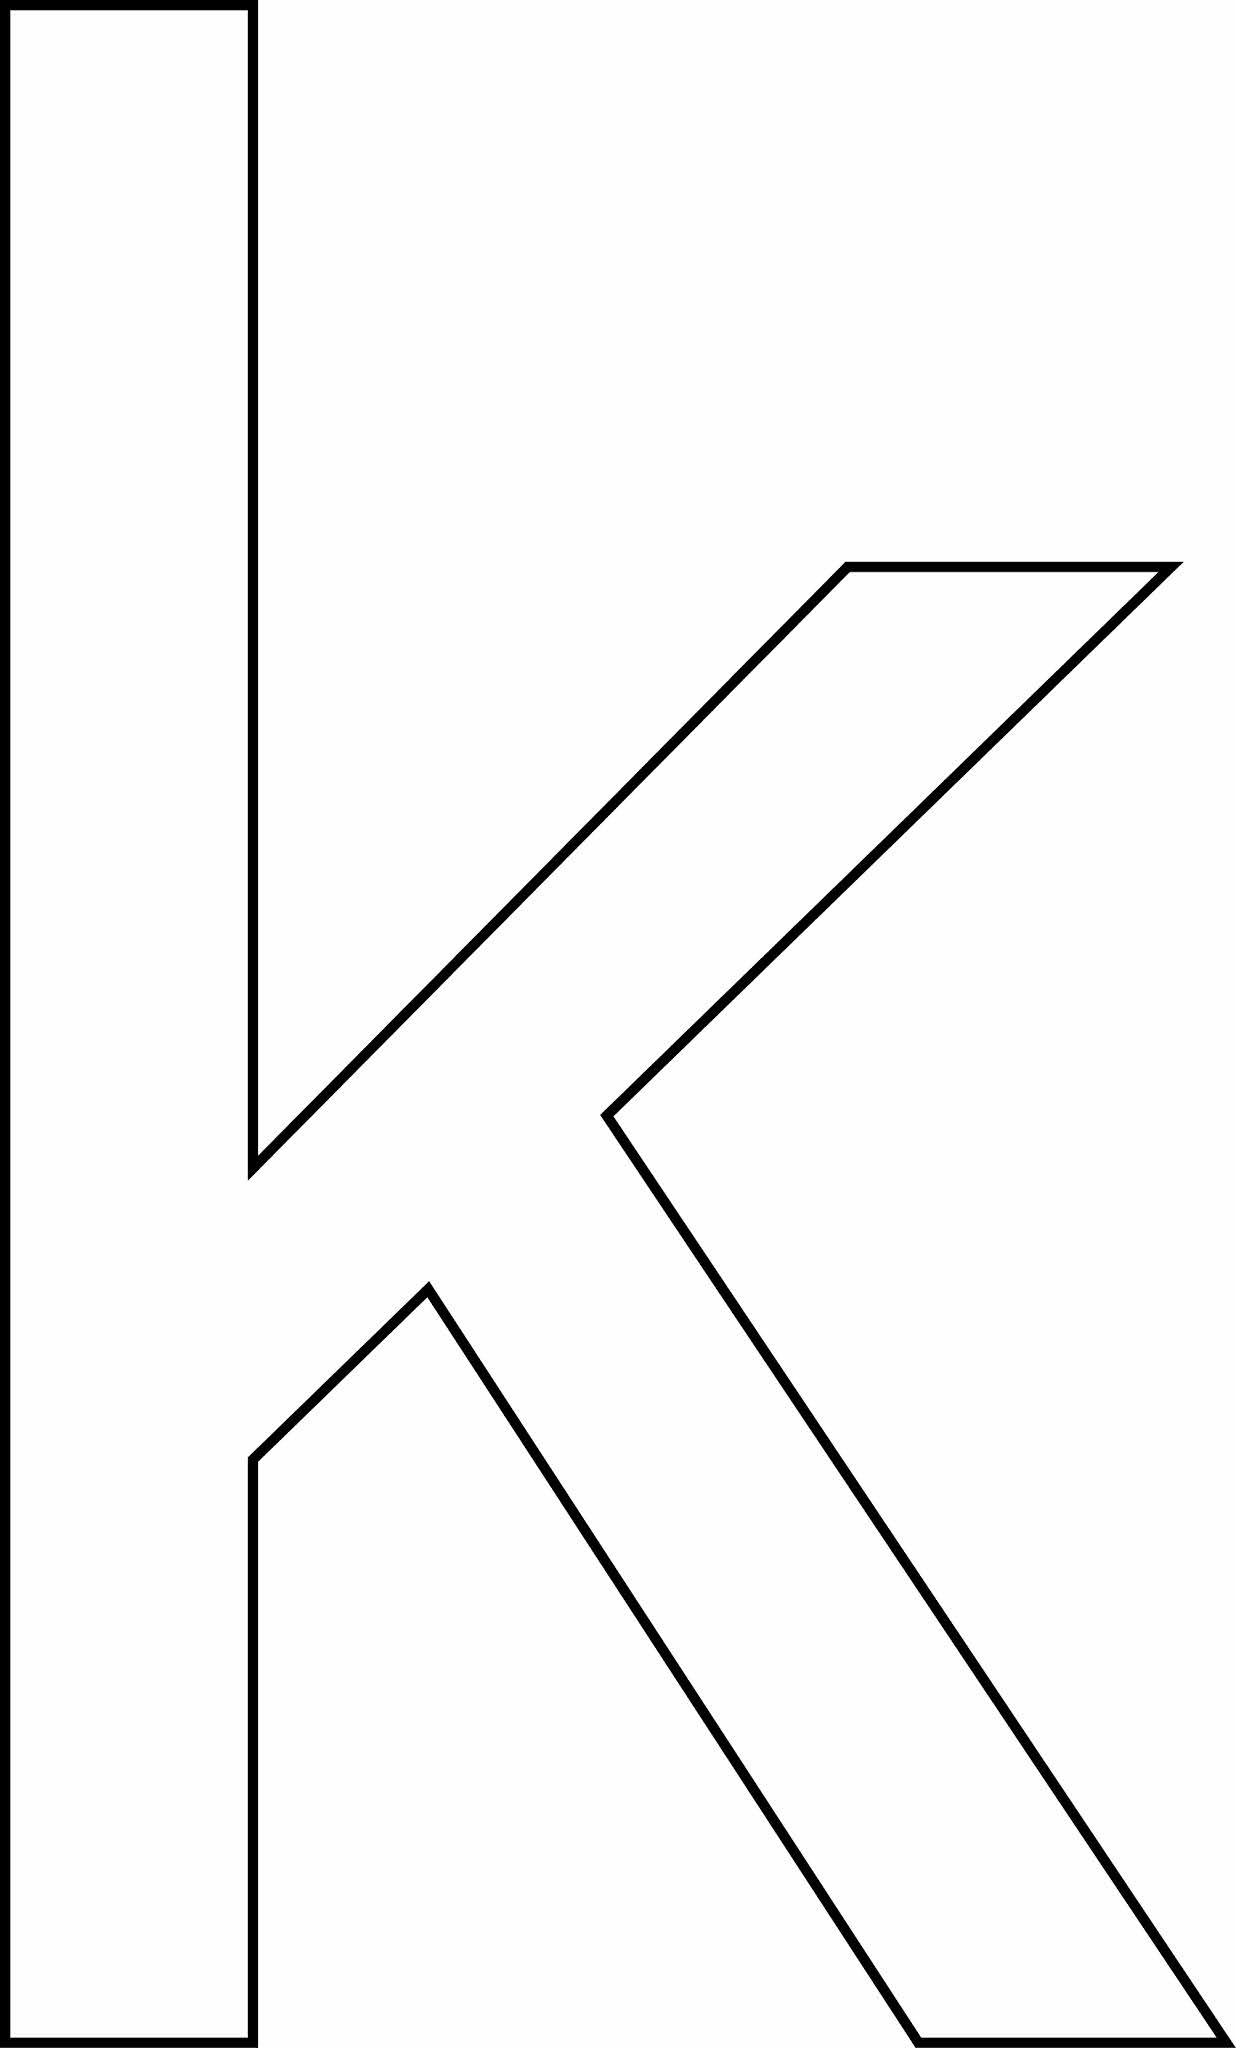 Letra K - minúscula para imprimir